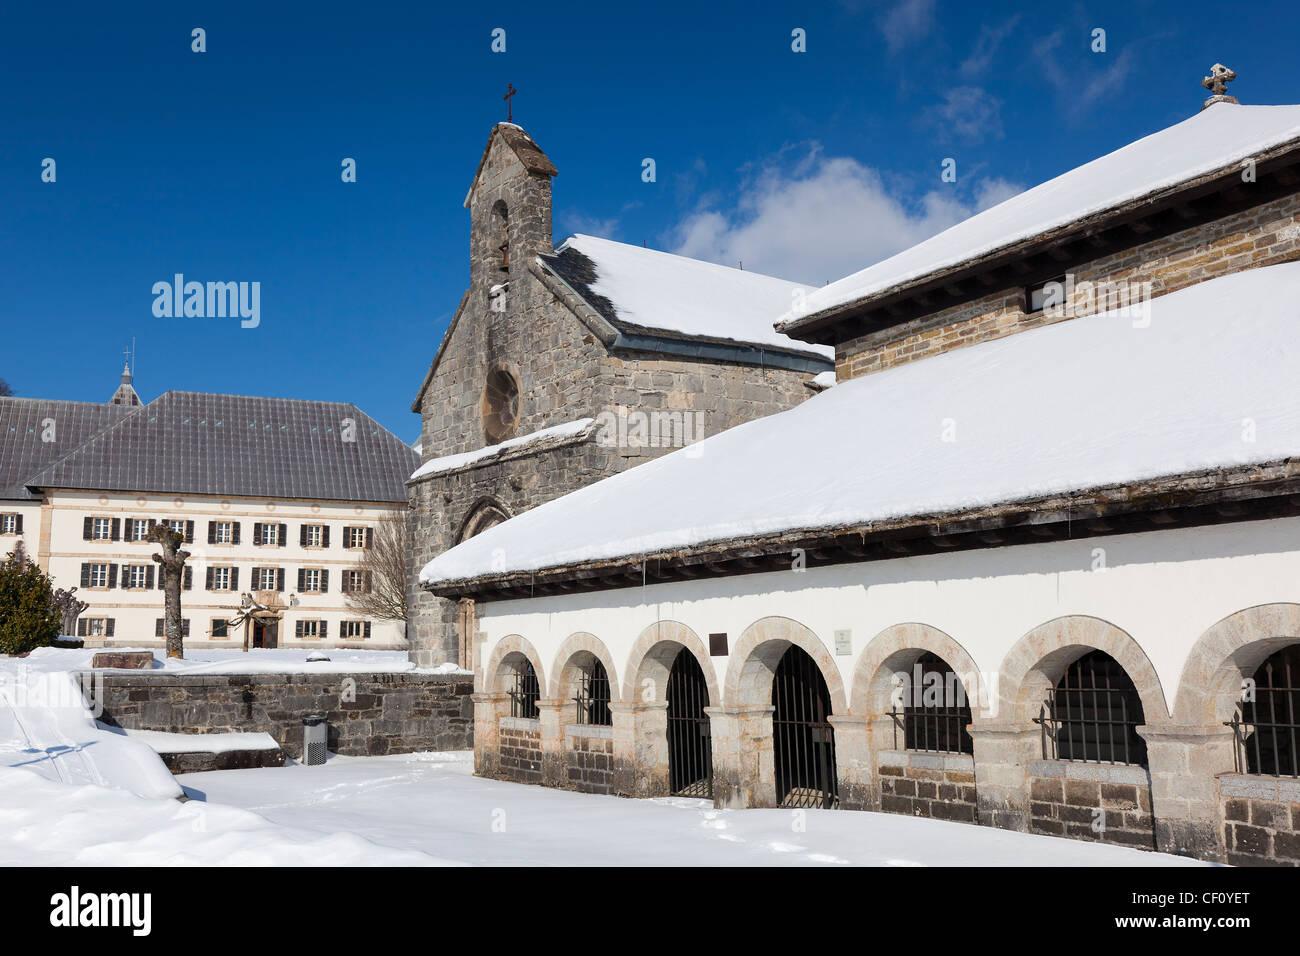 Orreaga/Roncesvalles, Navarra, Spain - Stock Image